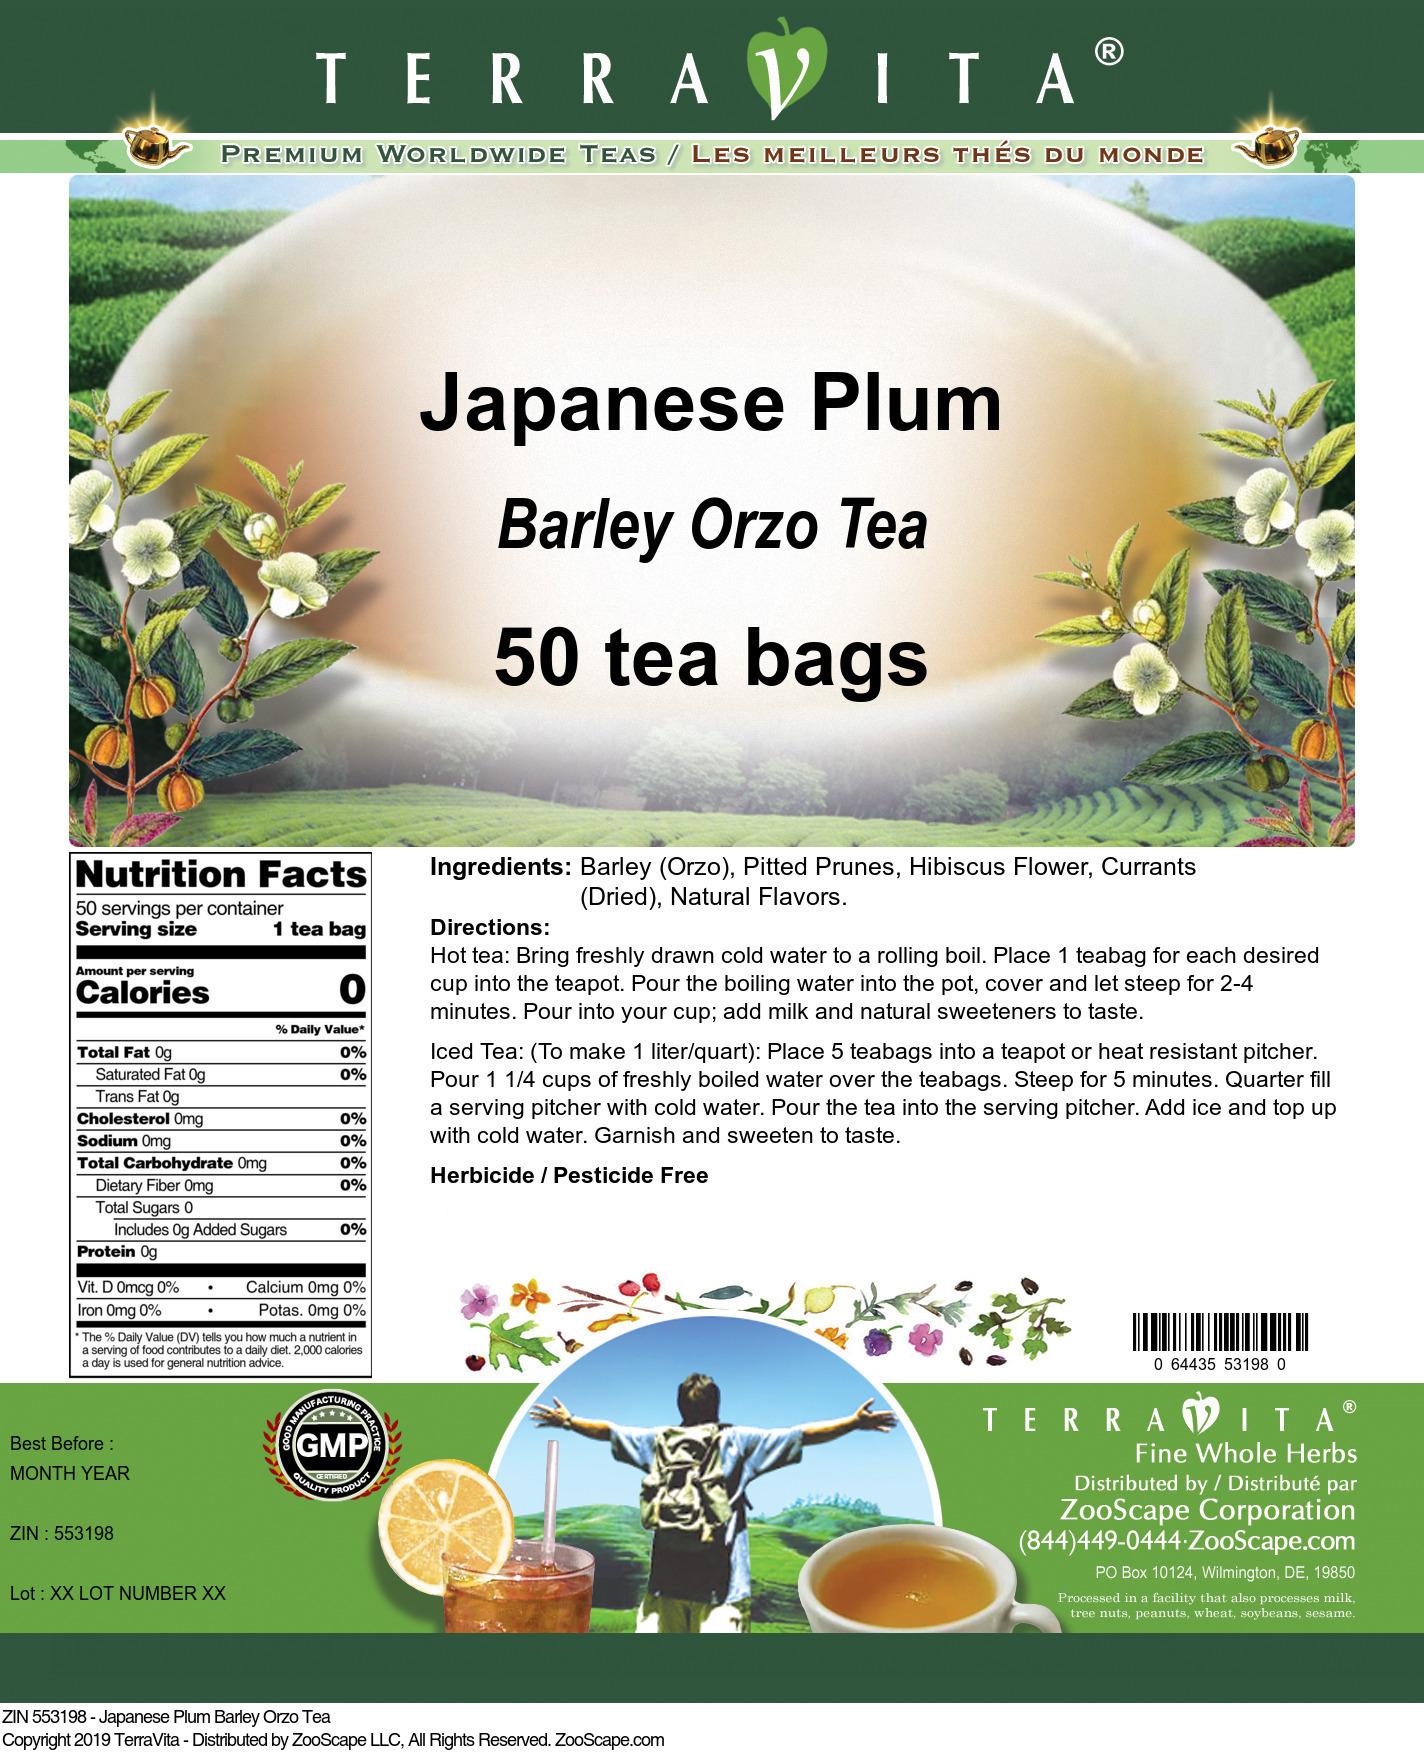 Japanese Plum Barley Orzo Tea